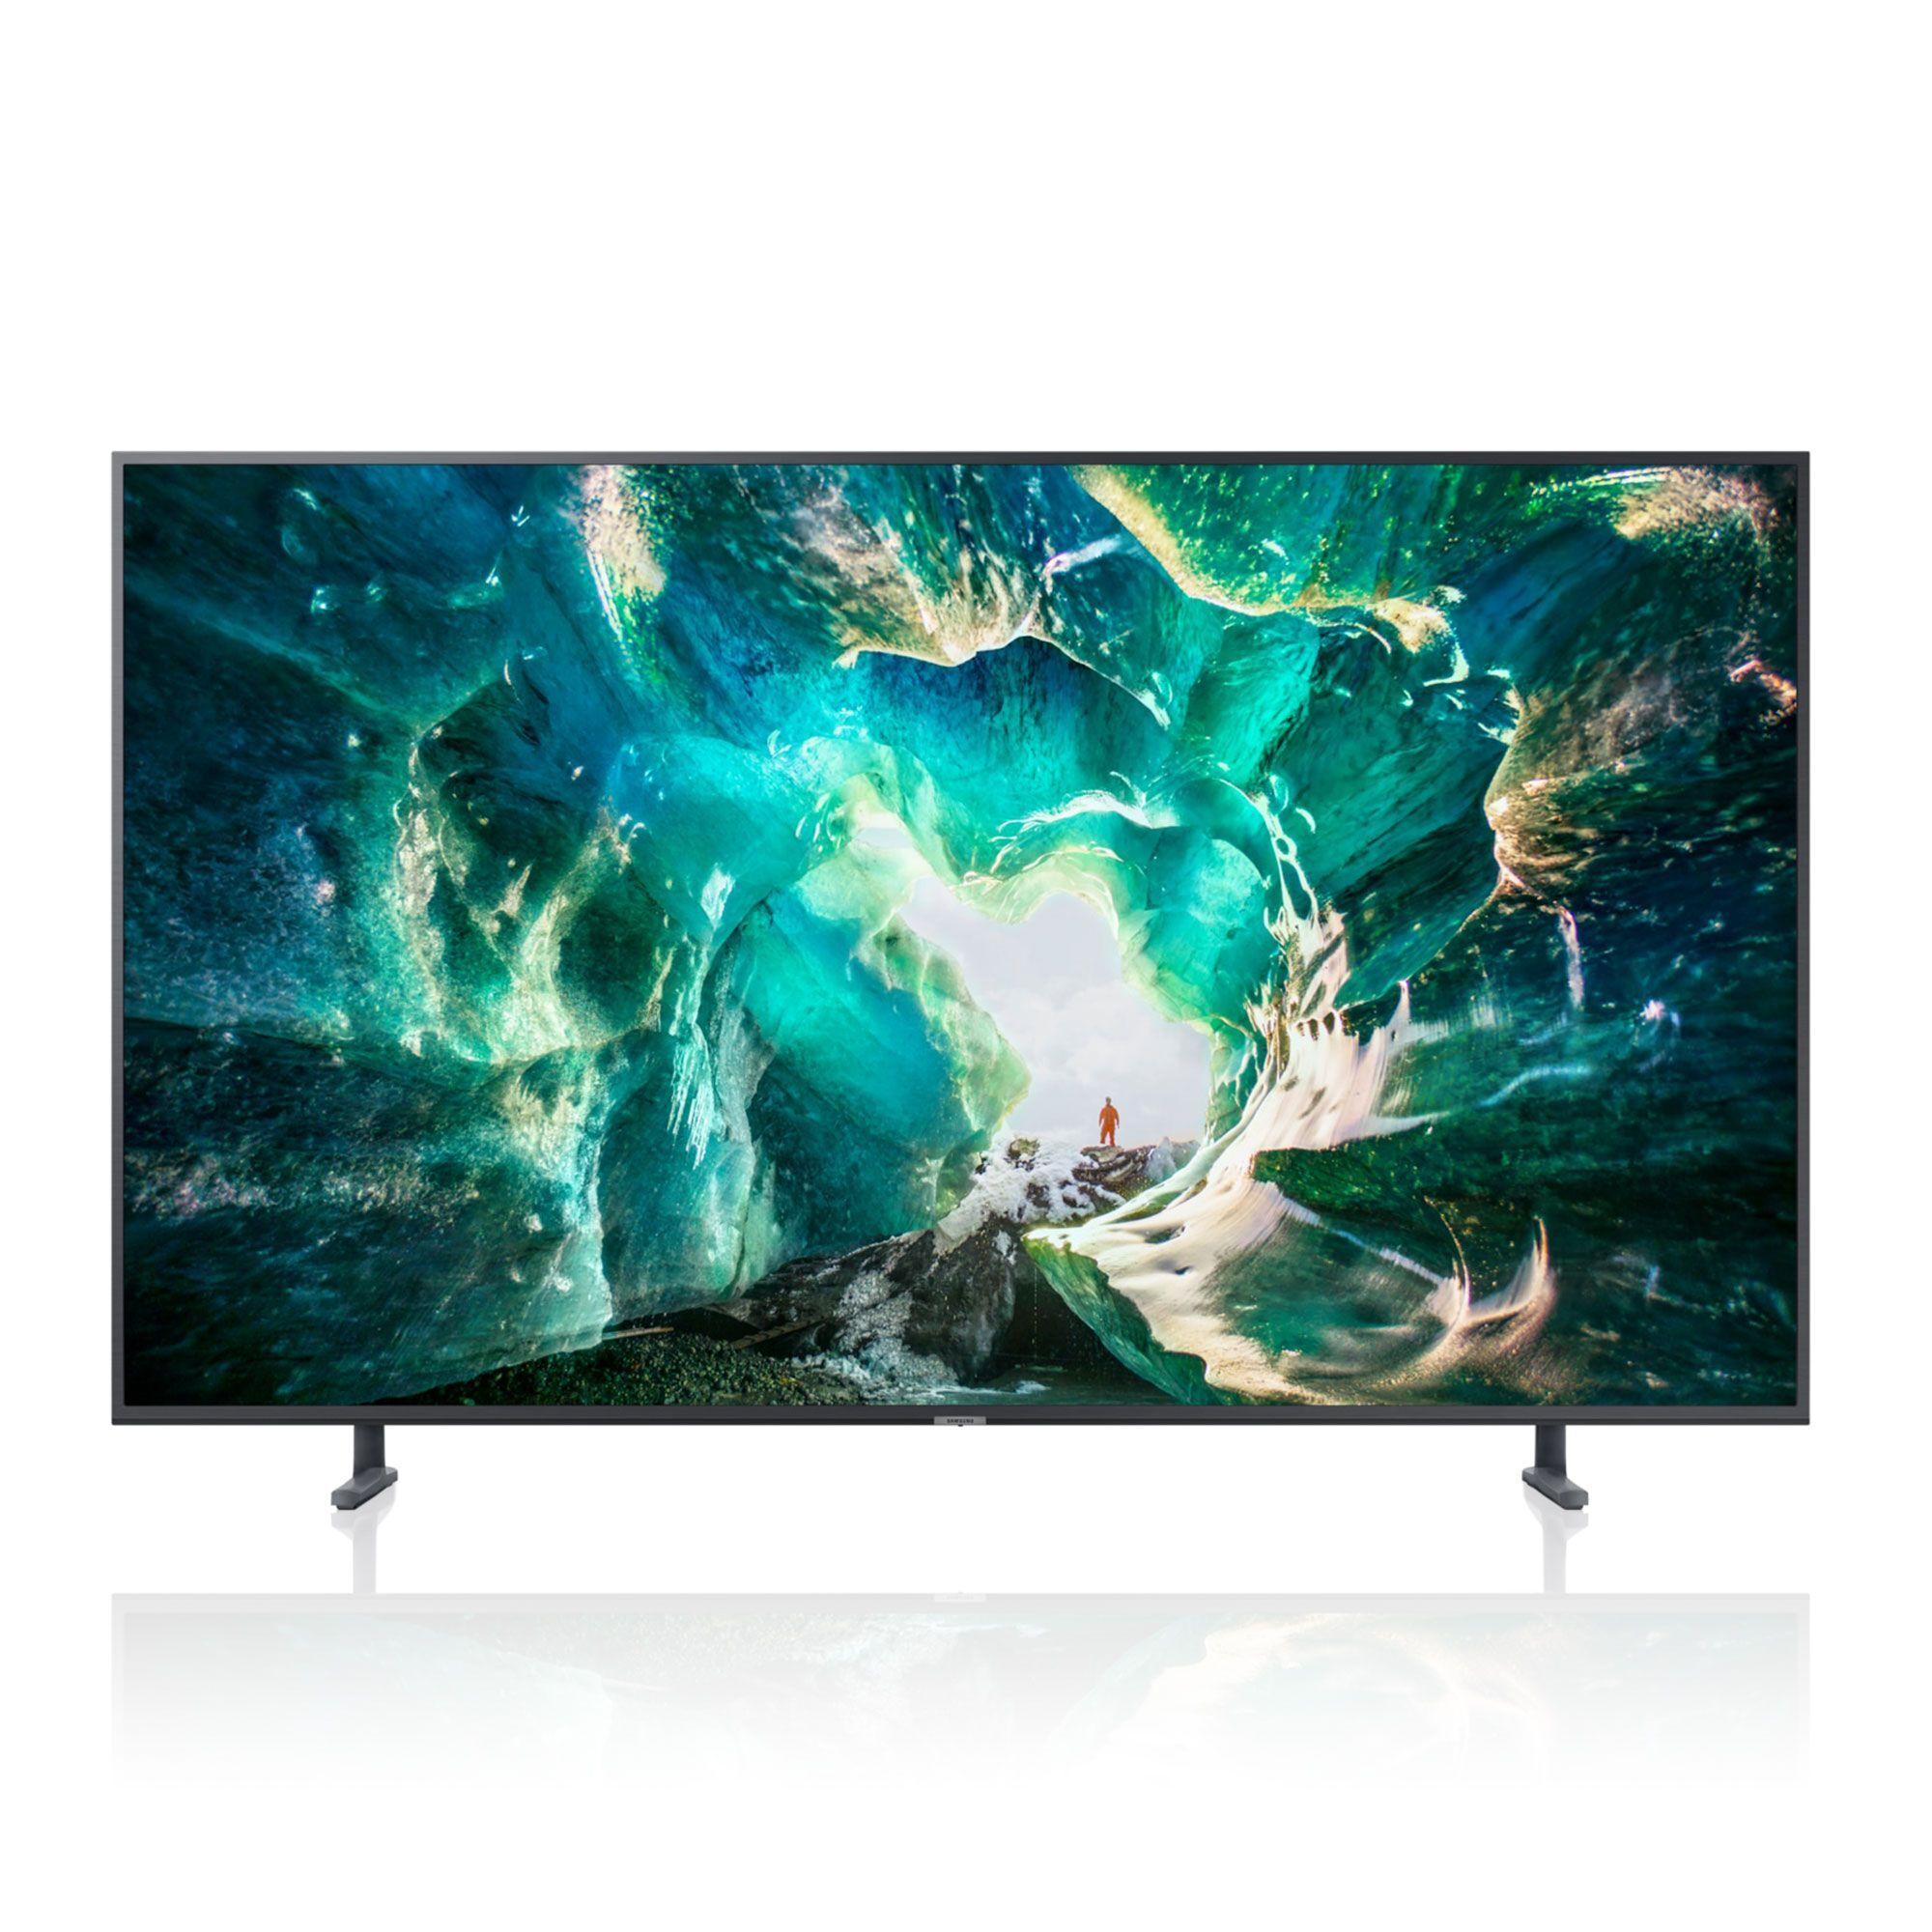 Samsung RU8000UXZT Smart TV LED UHD 4K 49